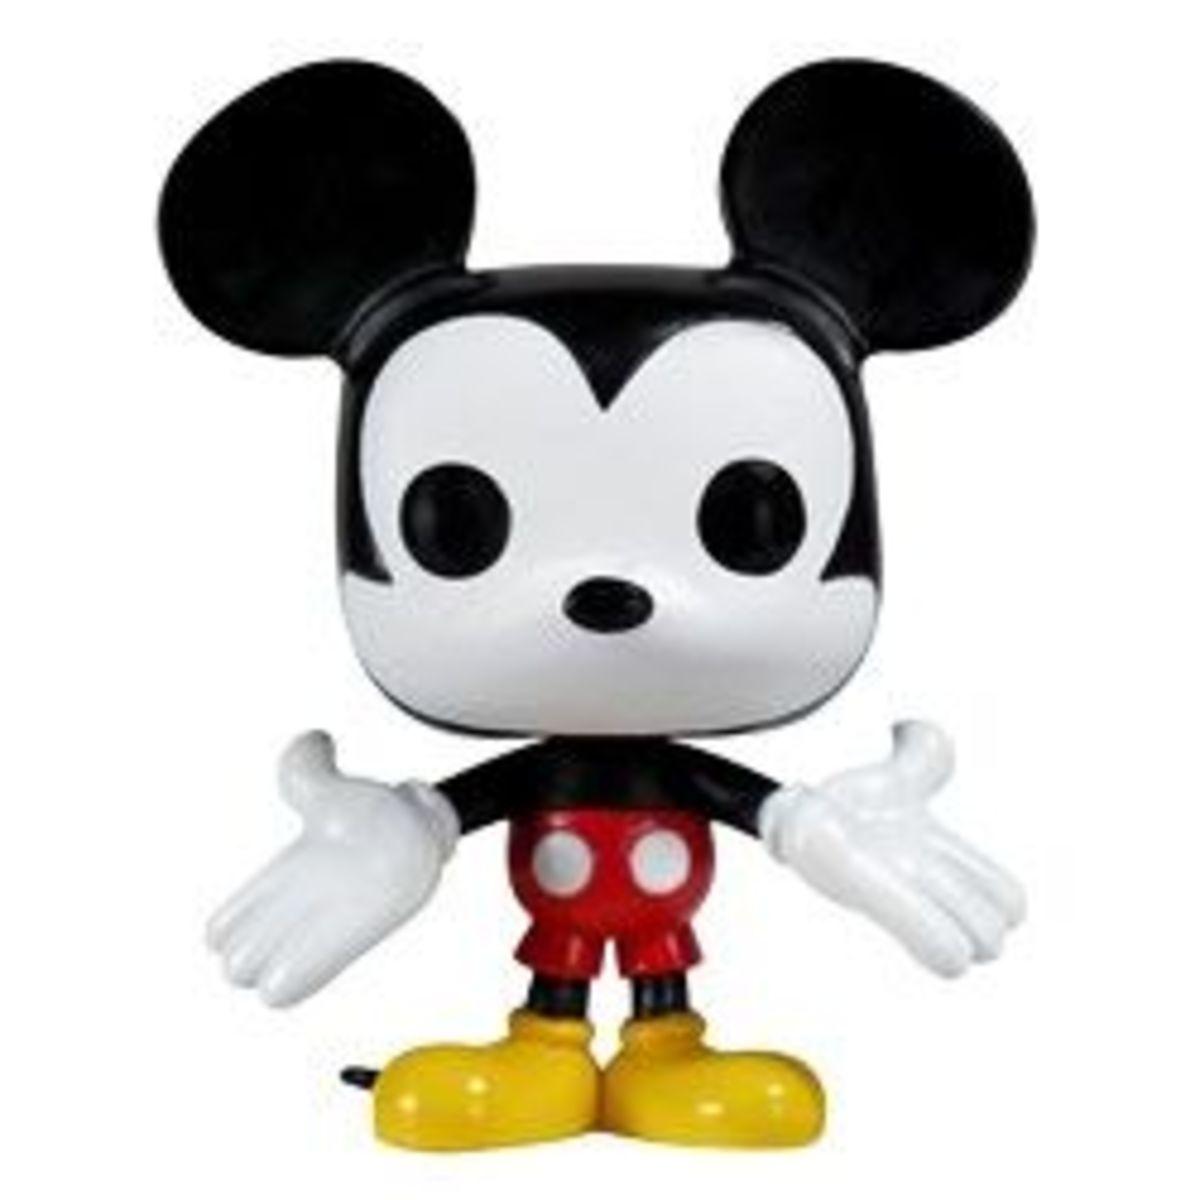 Disney Pop! Action Figure Toys